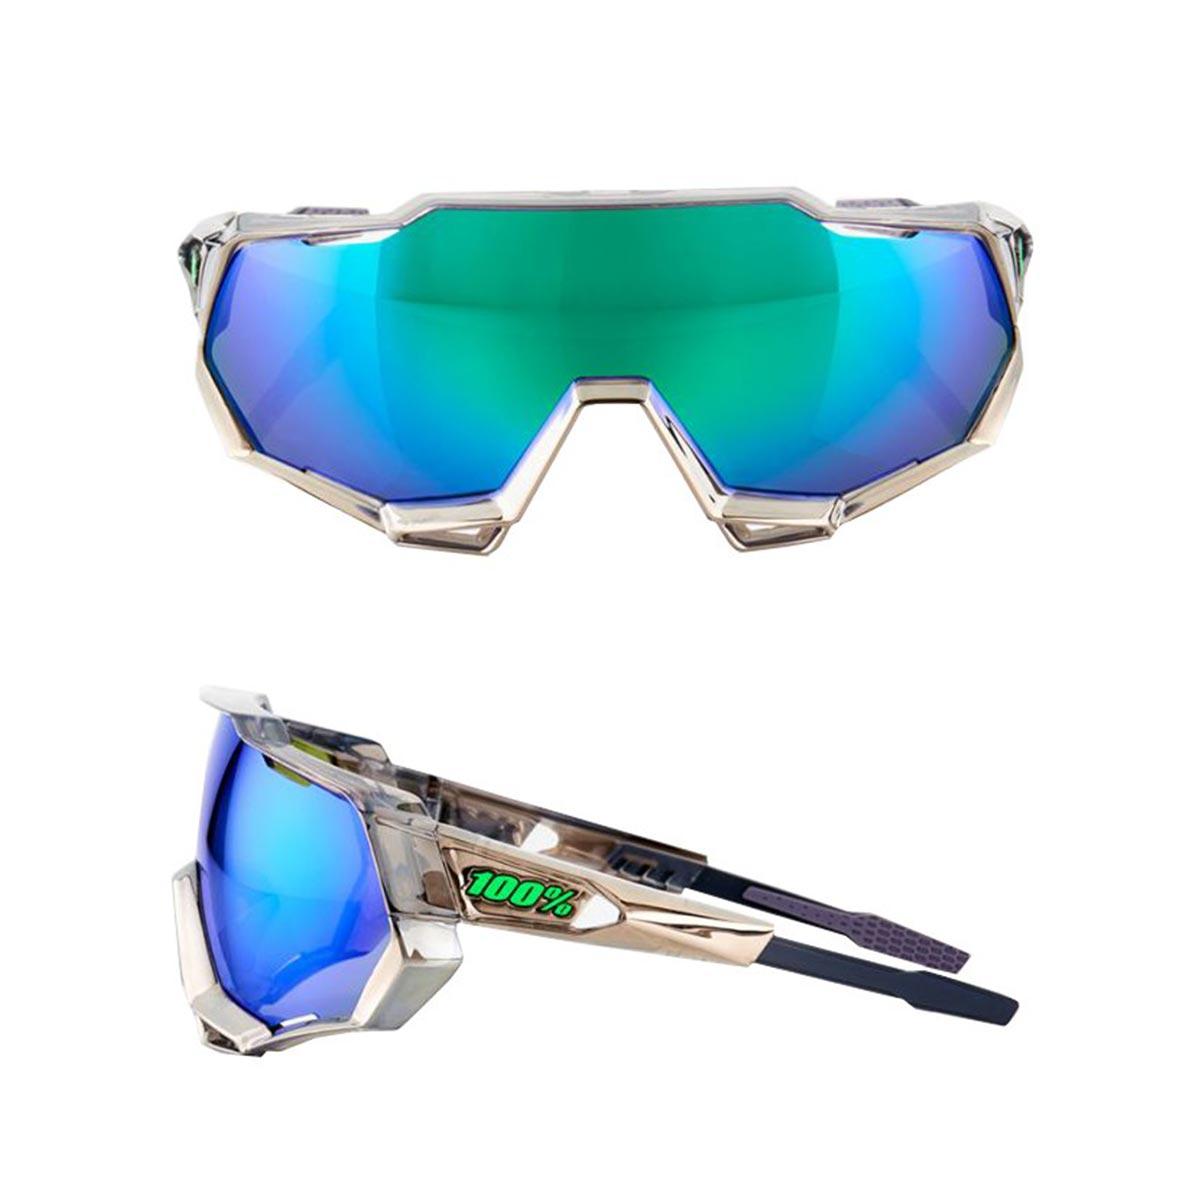 468cf8fa1bb Speedtrap - Peter Sagan Chromium Gunmetal - Green Multilayer Mirror - Pure  Endurance